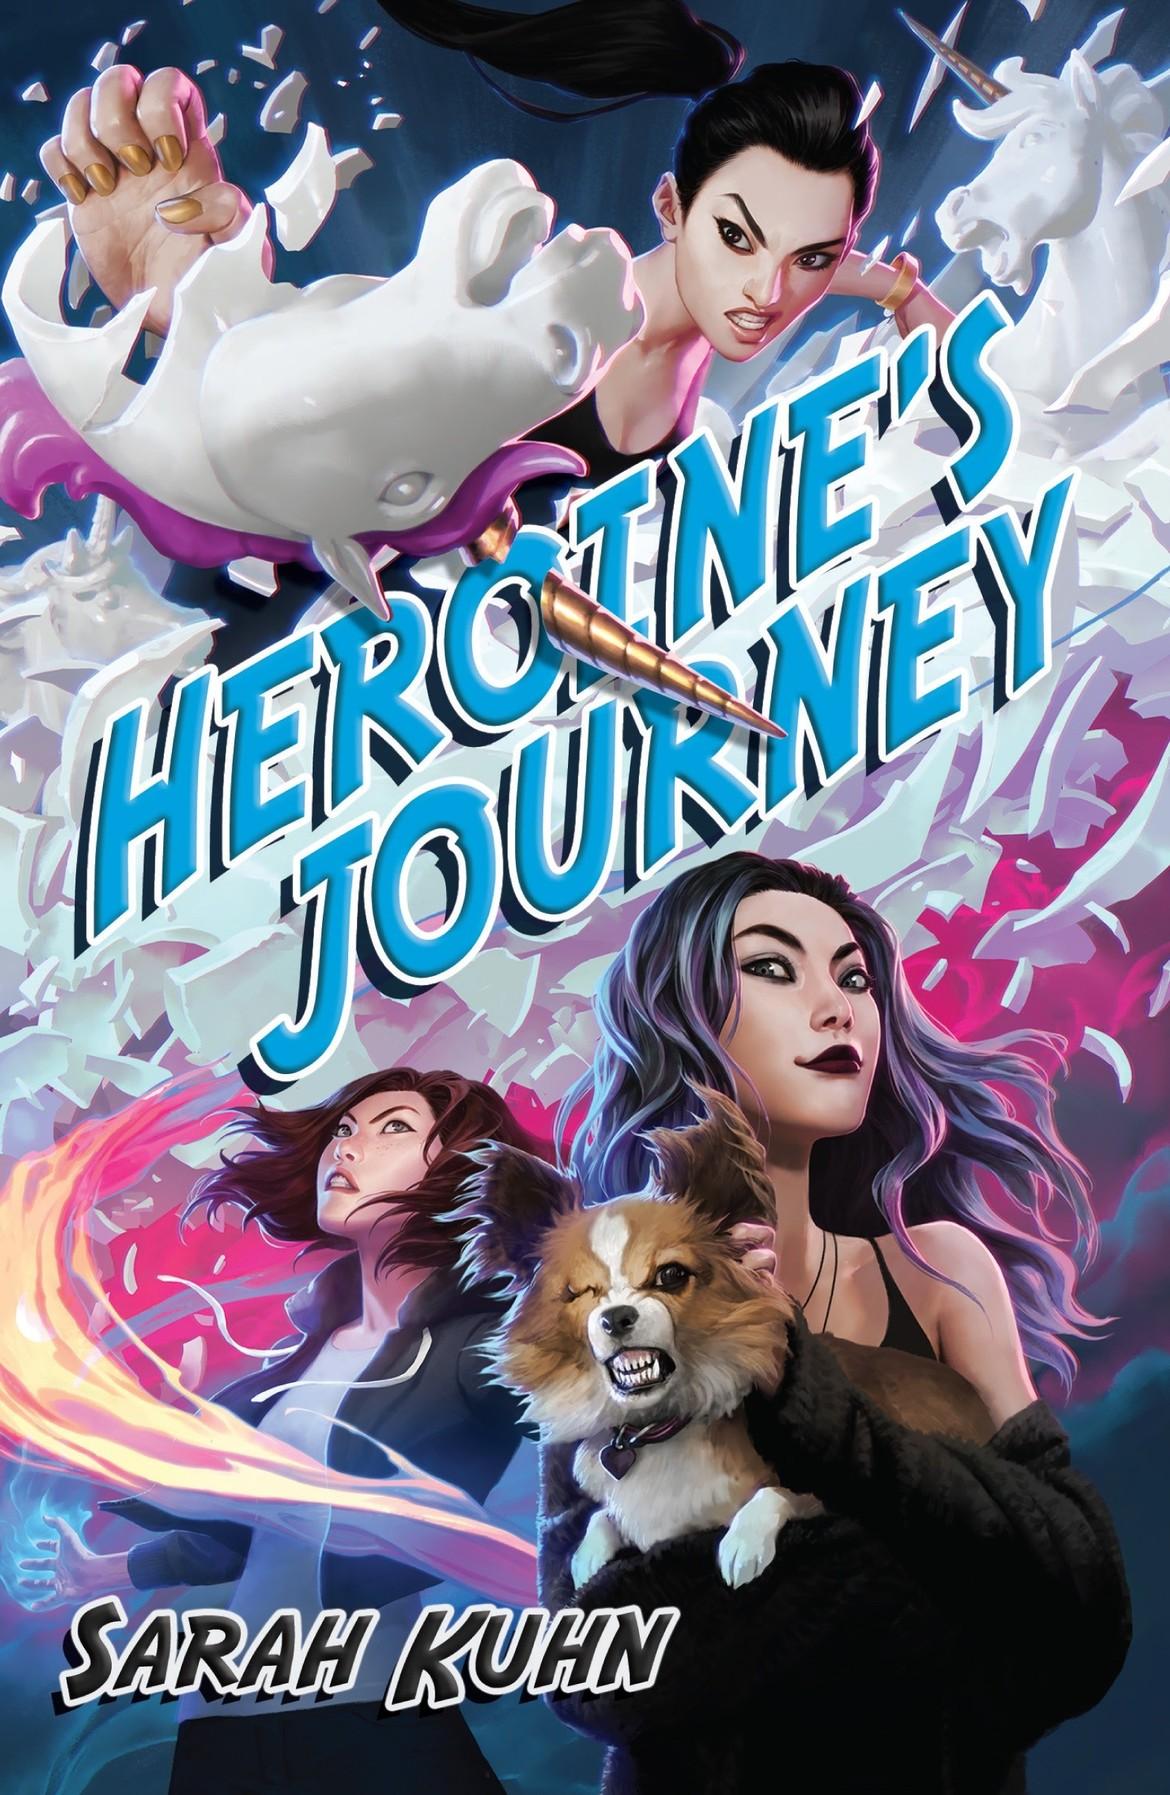 heroines_journey_front_cover_final.jpg